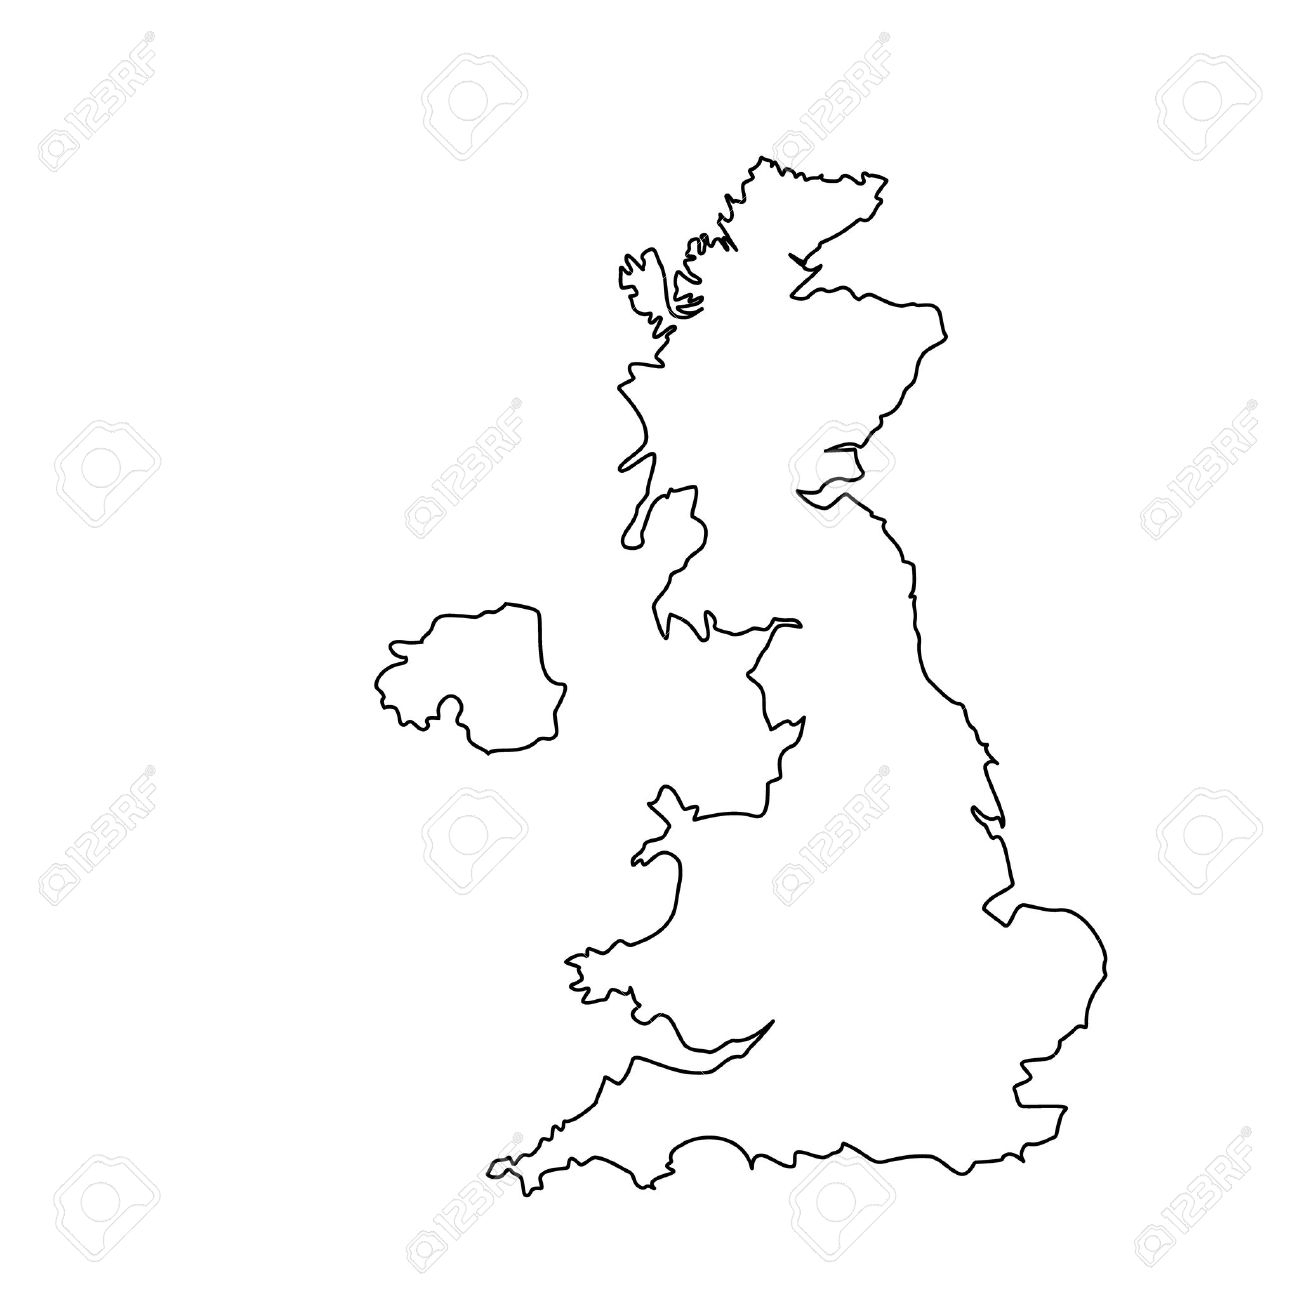 Vector Uk Carte Contour Dessin Illustration. Angleterre Icône Carte De  Ligne. Royaume-Uni De Grande-Bretagne. Uk Carte Comtés encequiconcerne Dessin De Angleterre